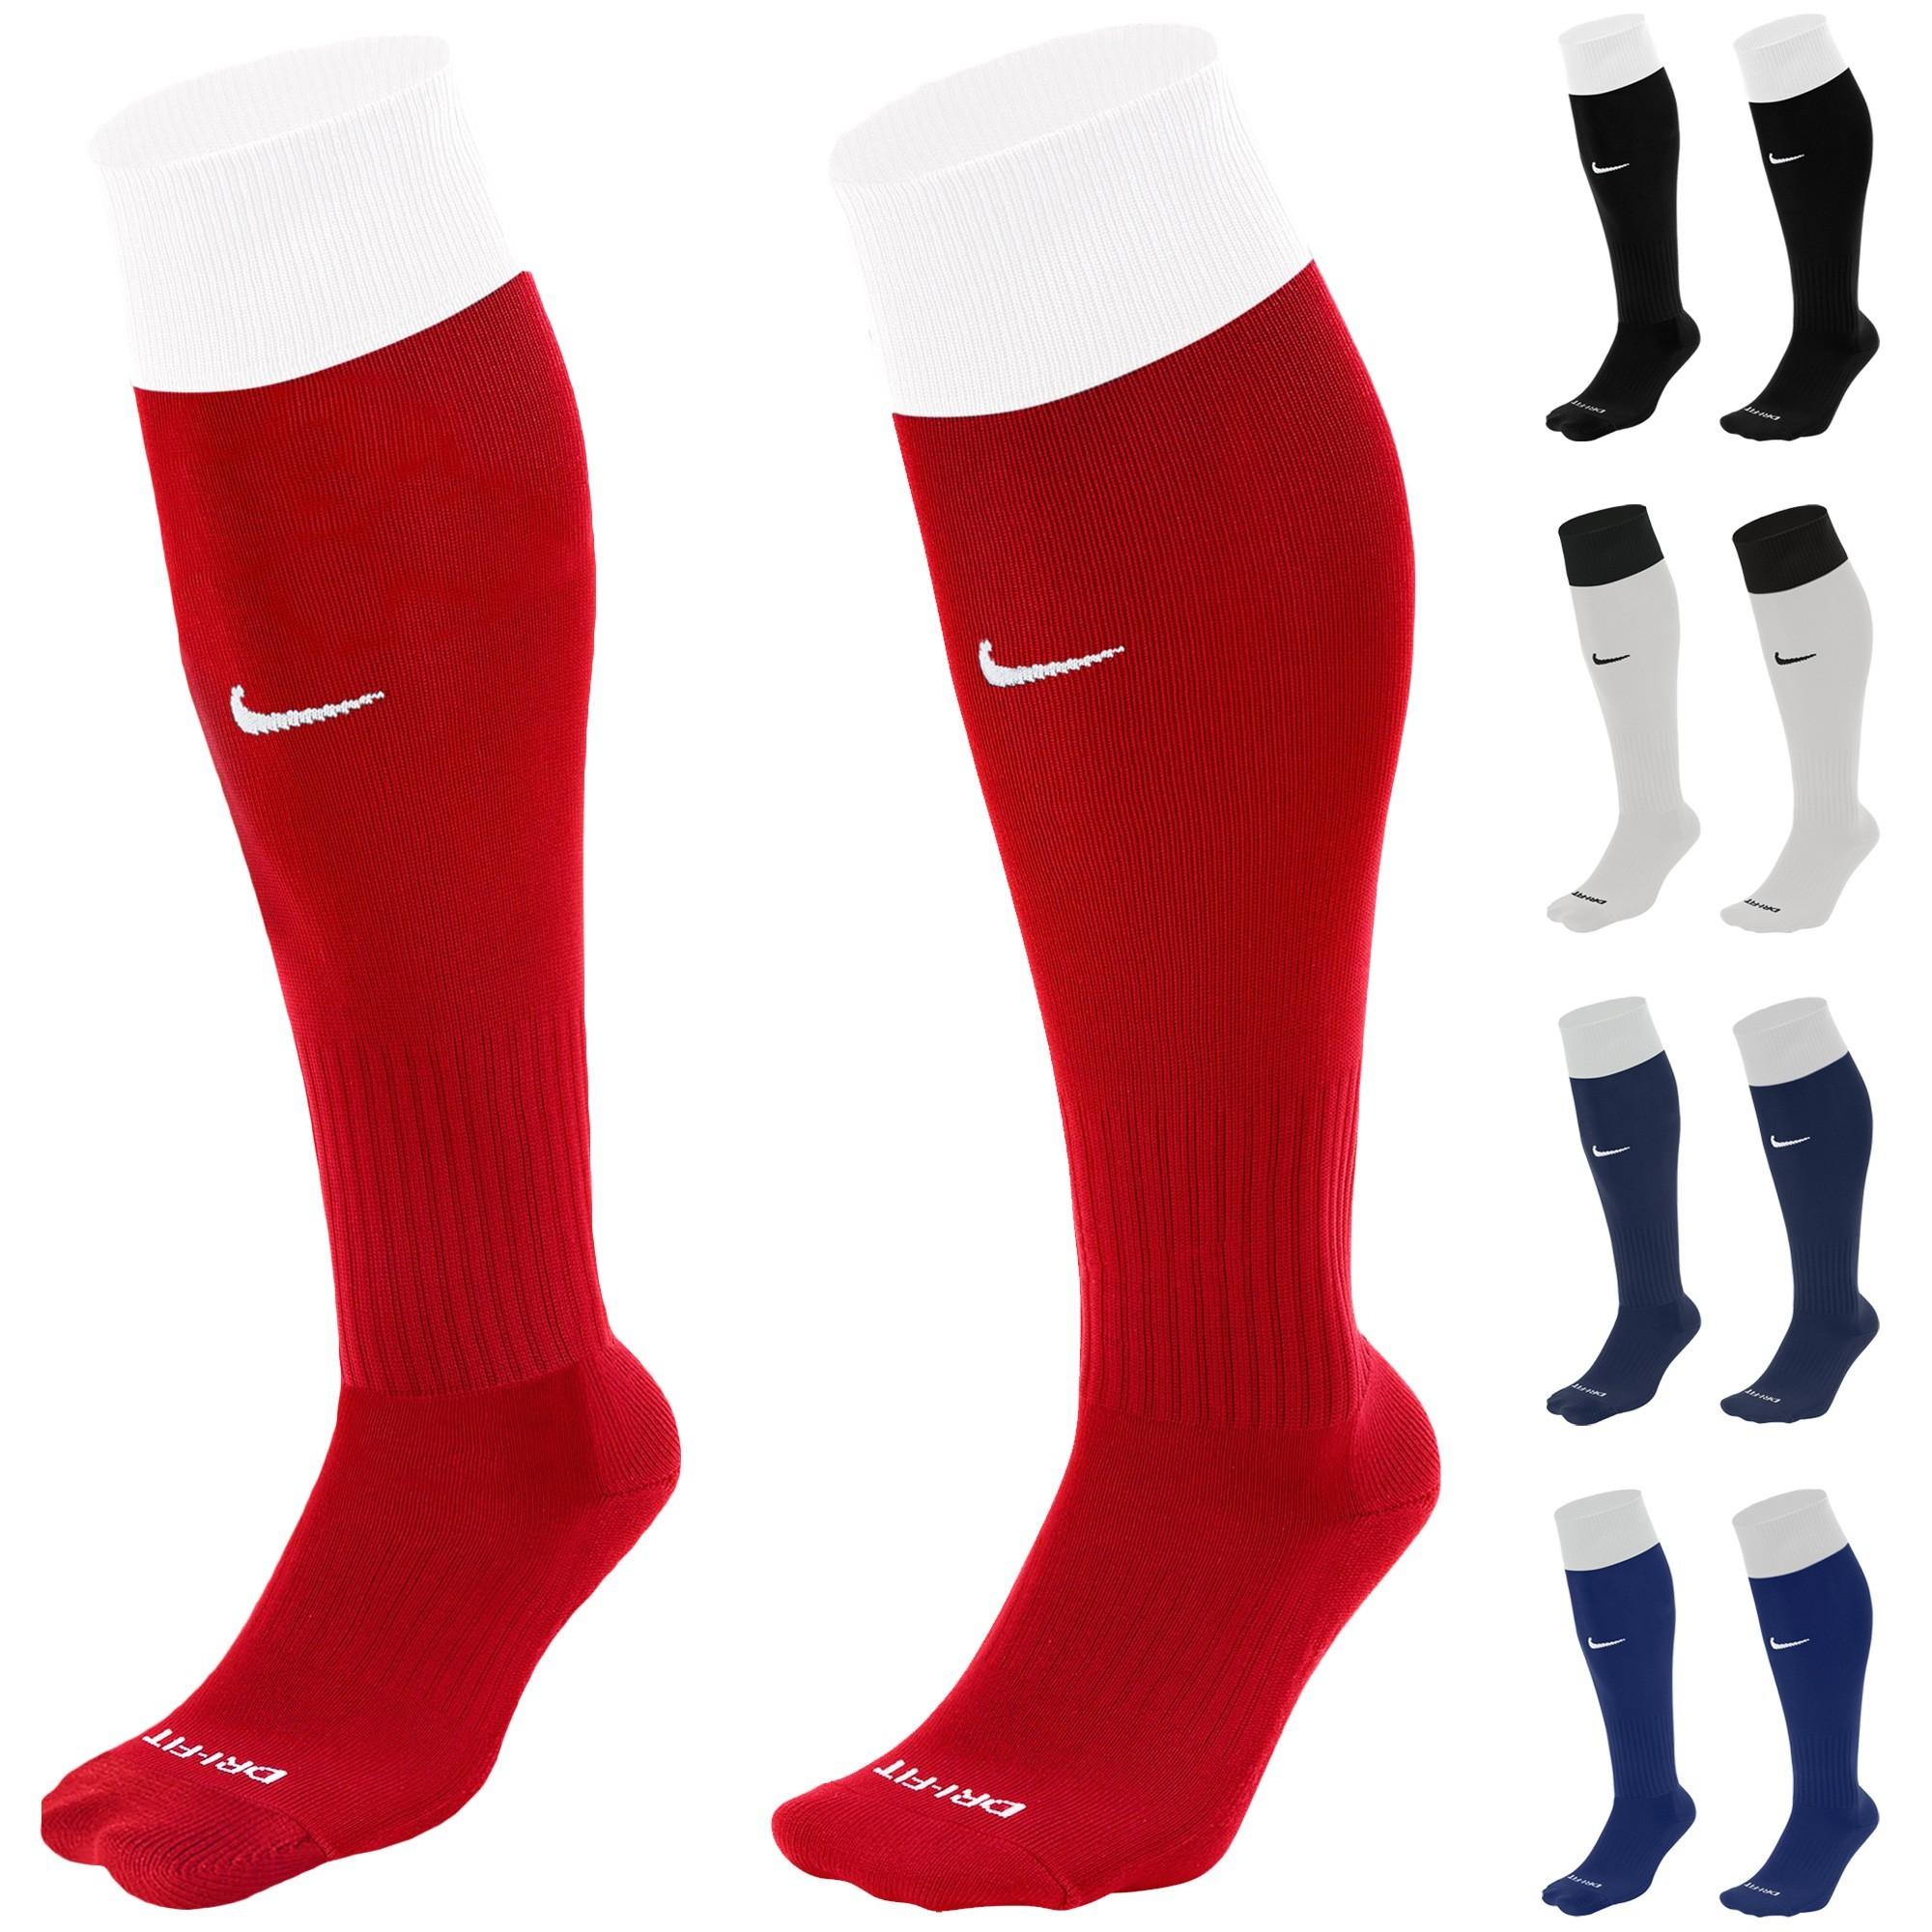 Nike Chaussettes de Football Classic II RougeBlanc | www